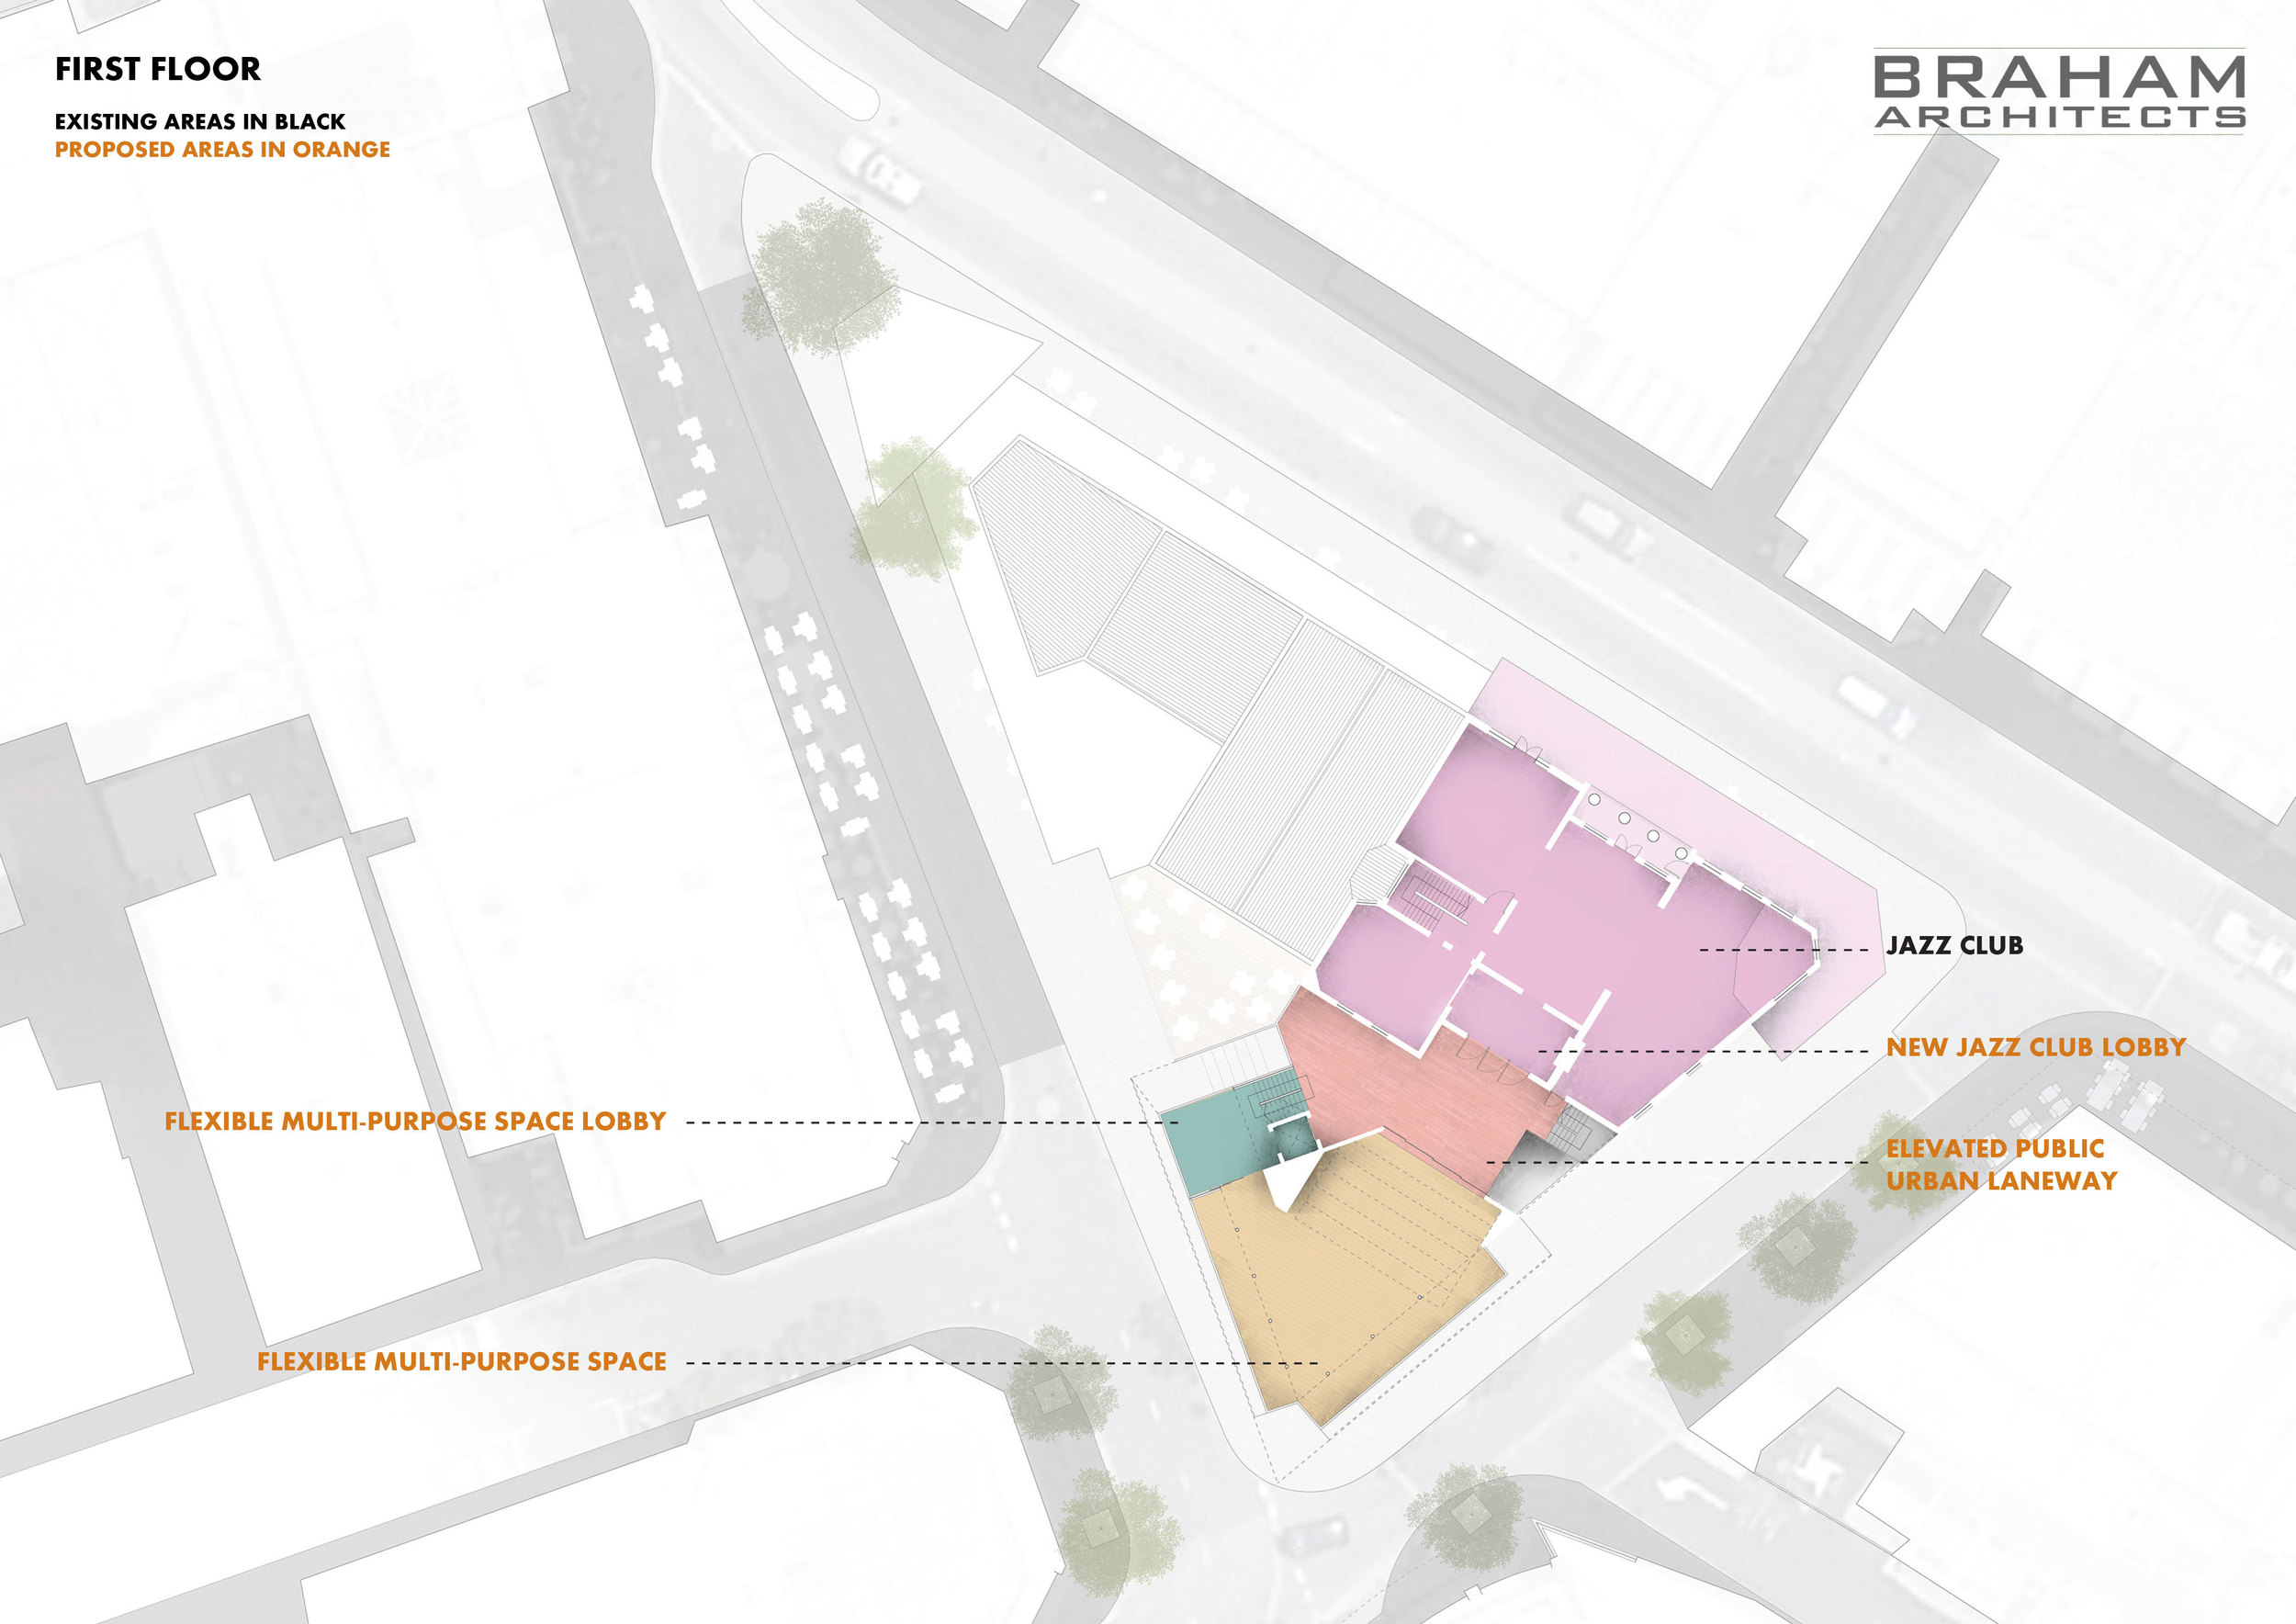 Braham-Architects-EvanDavies-FFPlan.jpg